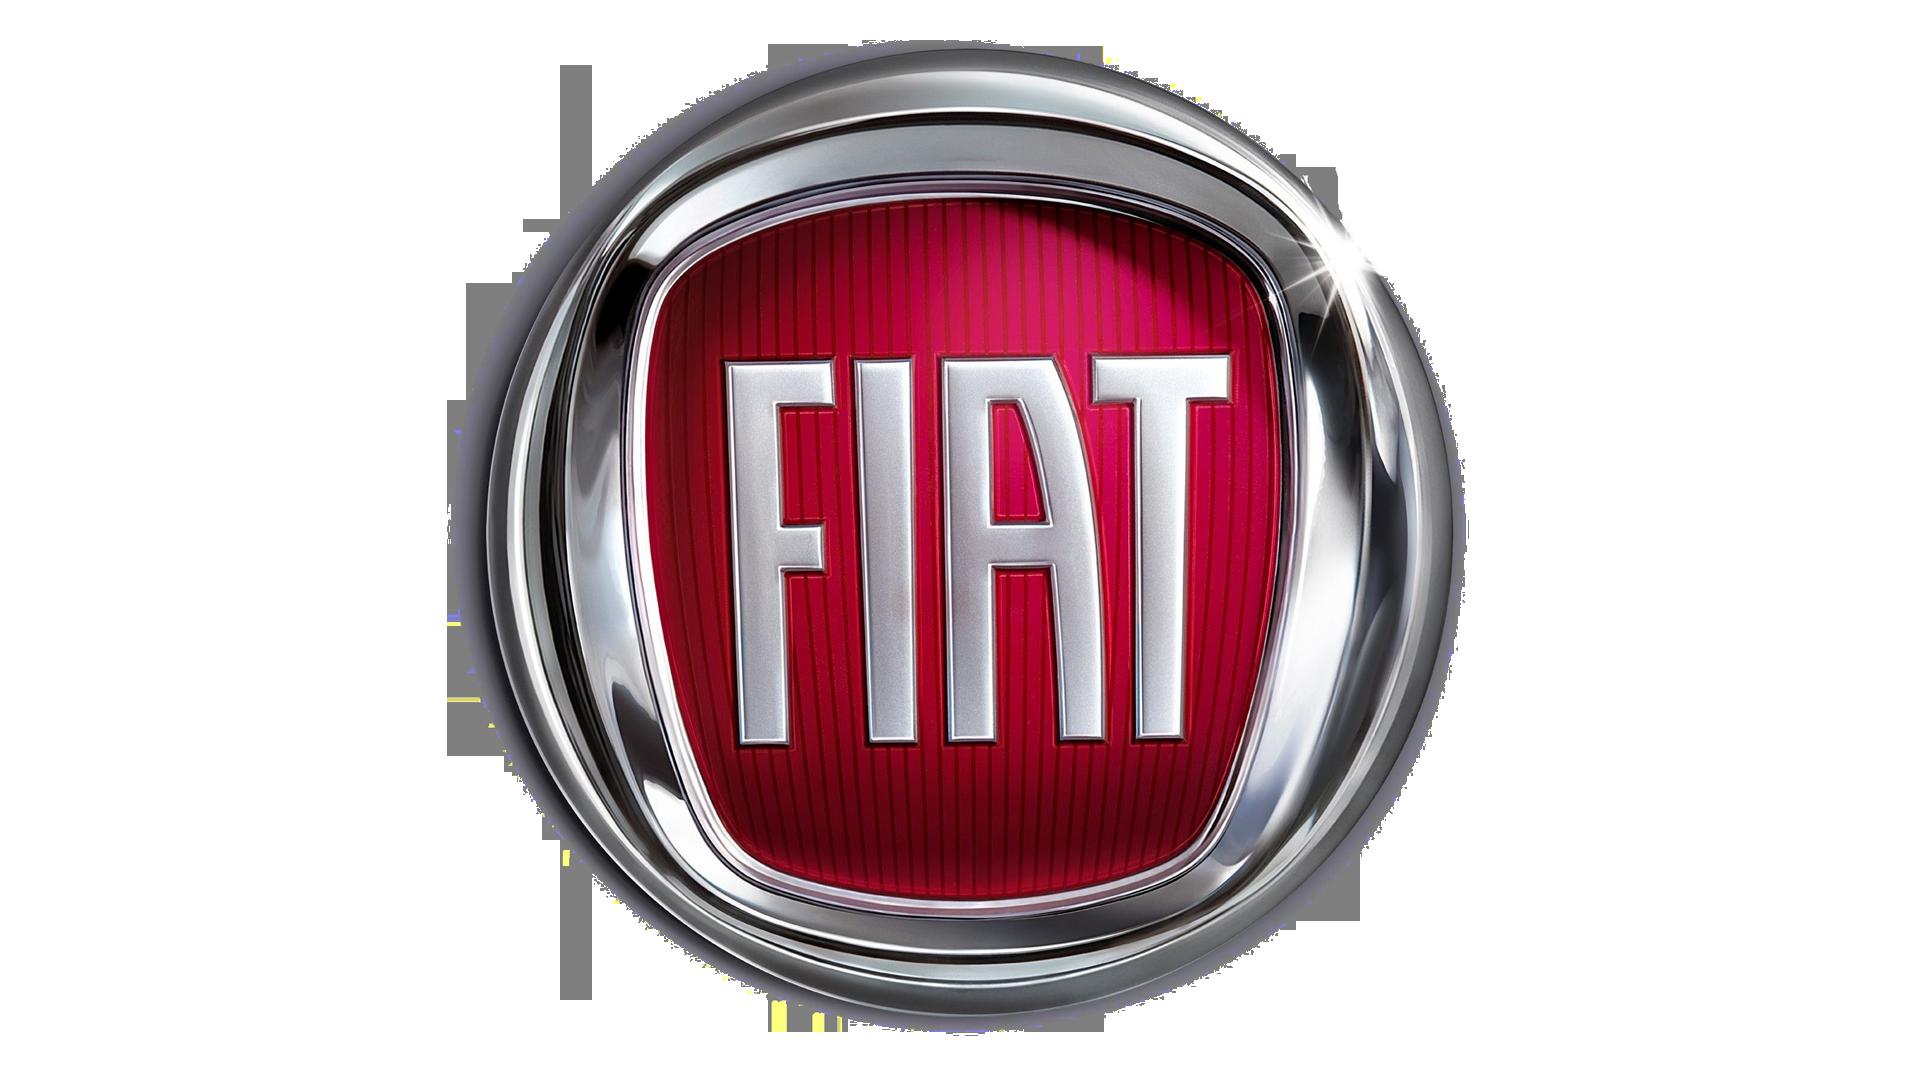 1920x1080 HD png - Fiat HD PNG